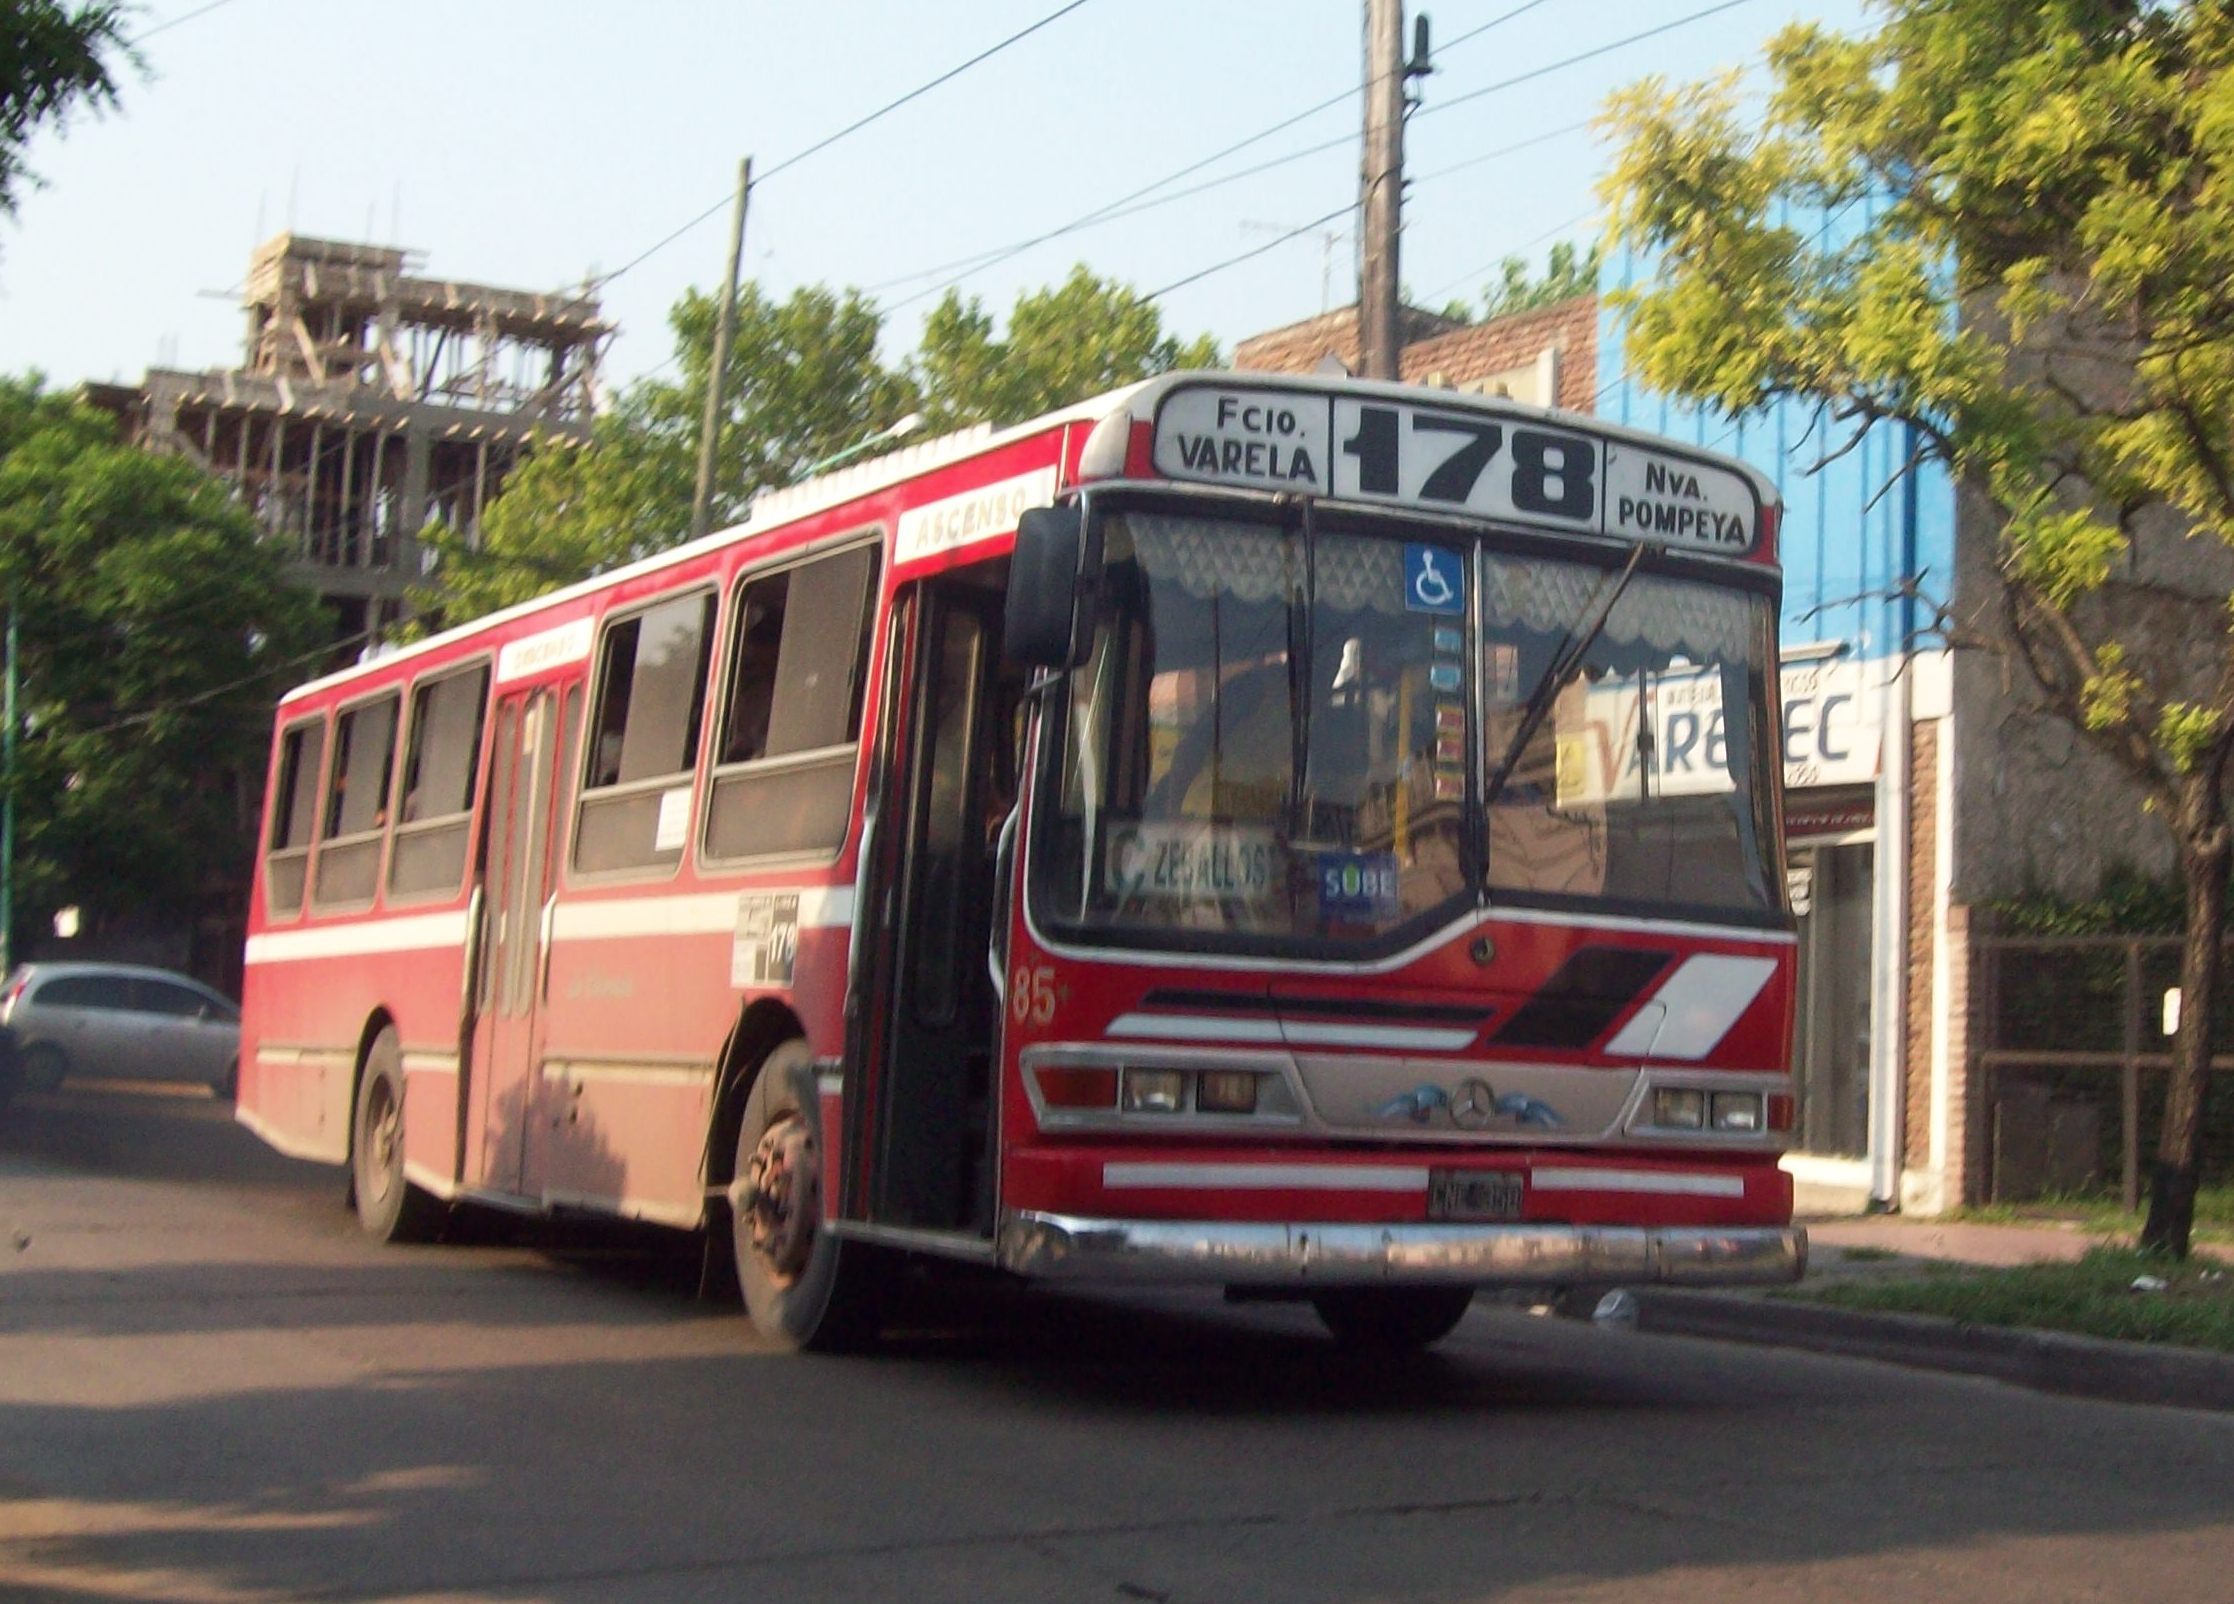 File:Línea 178 en Florencio Varela.JPG